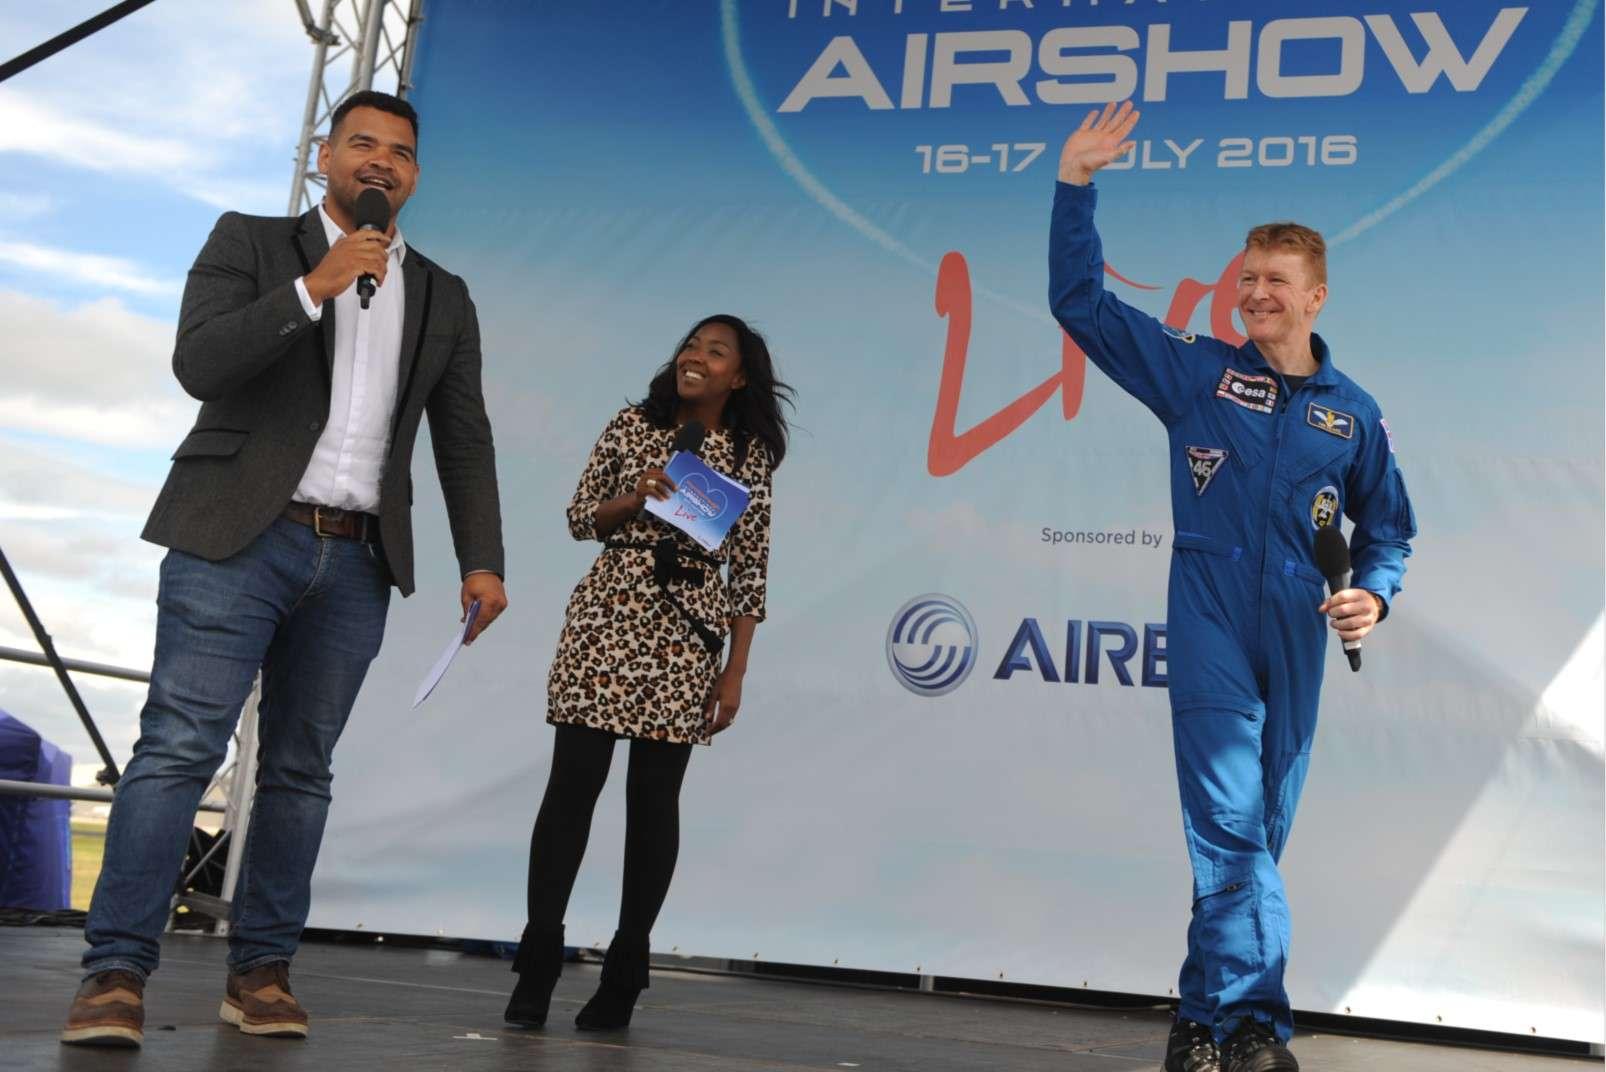 Farnborough International Airshow 16-22 July